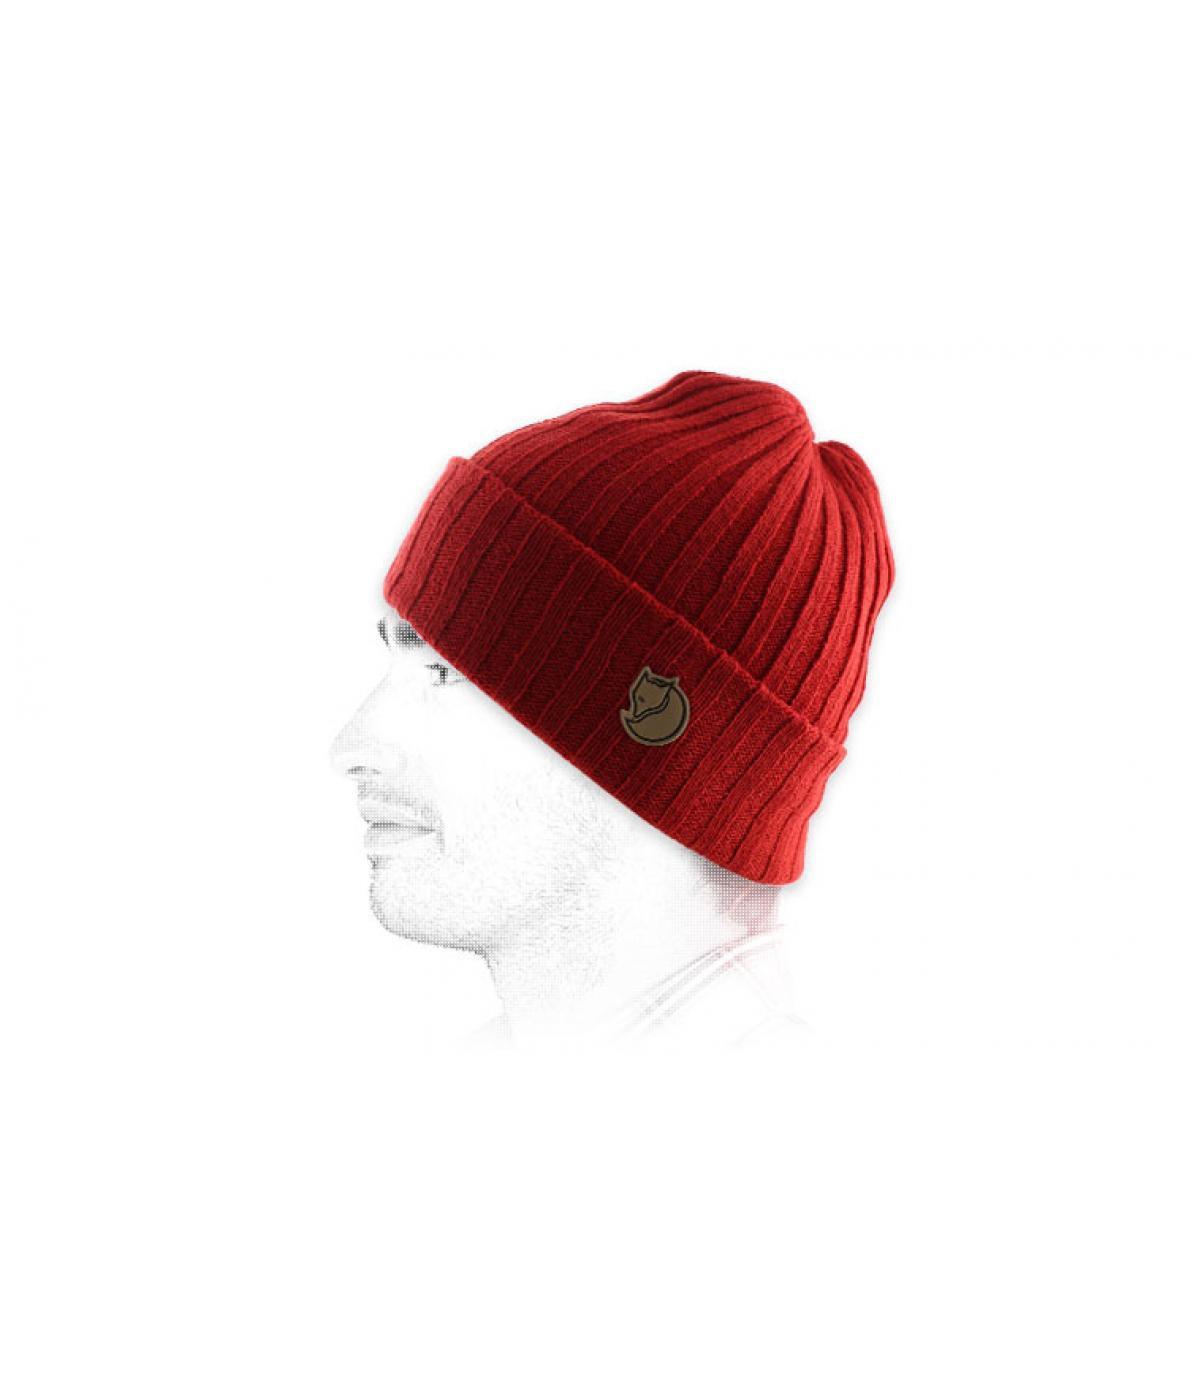 gorra roja Fjällräven revés